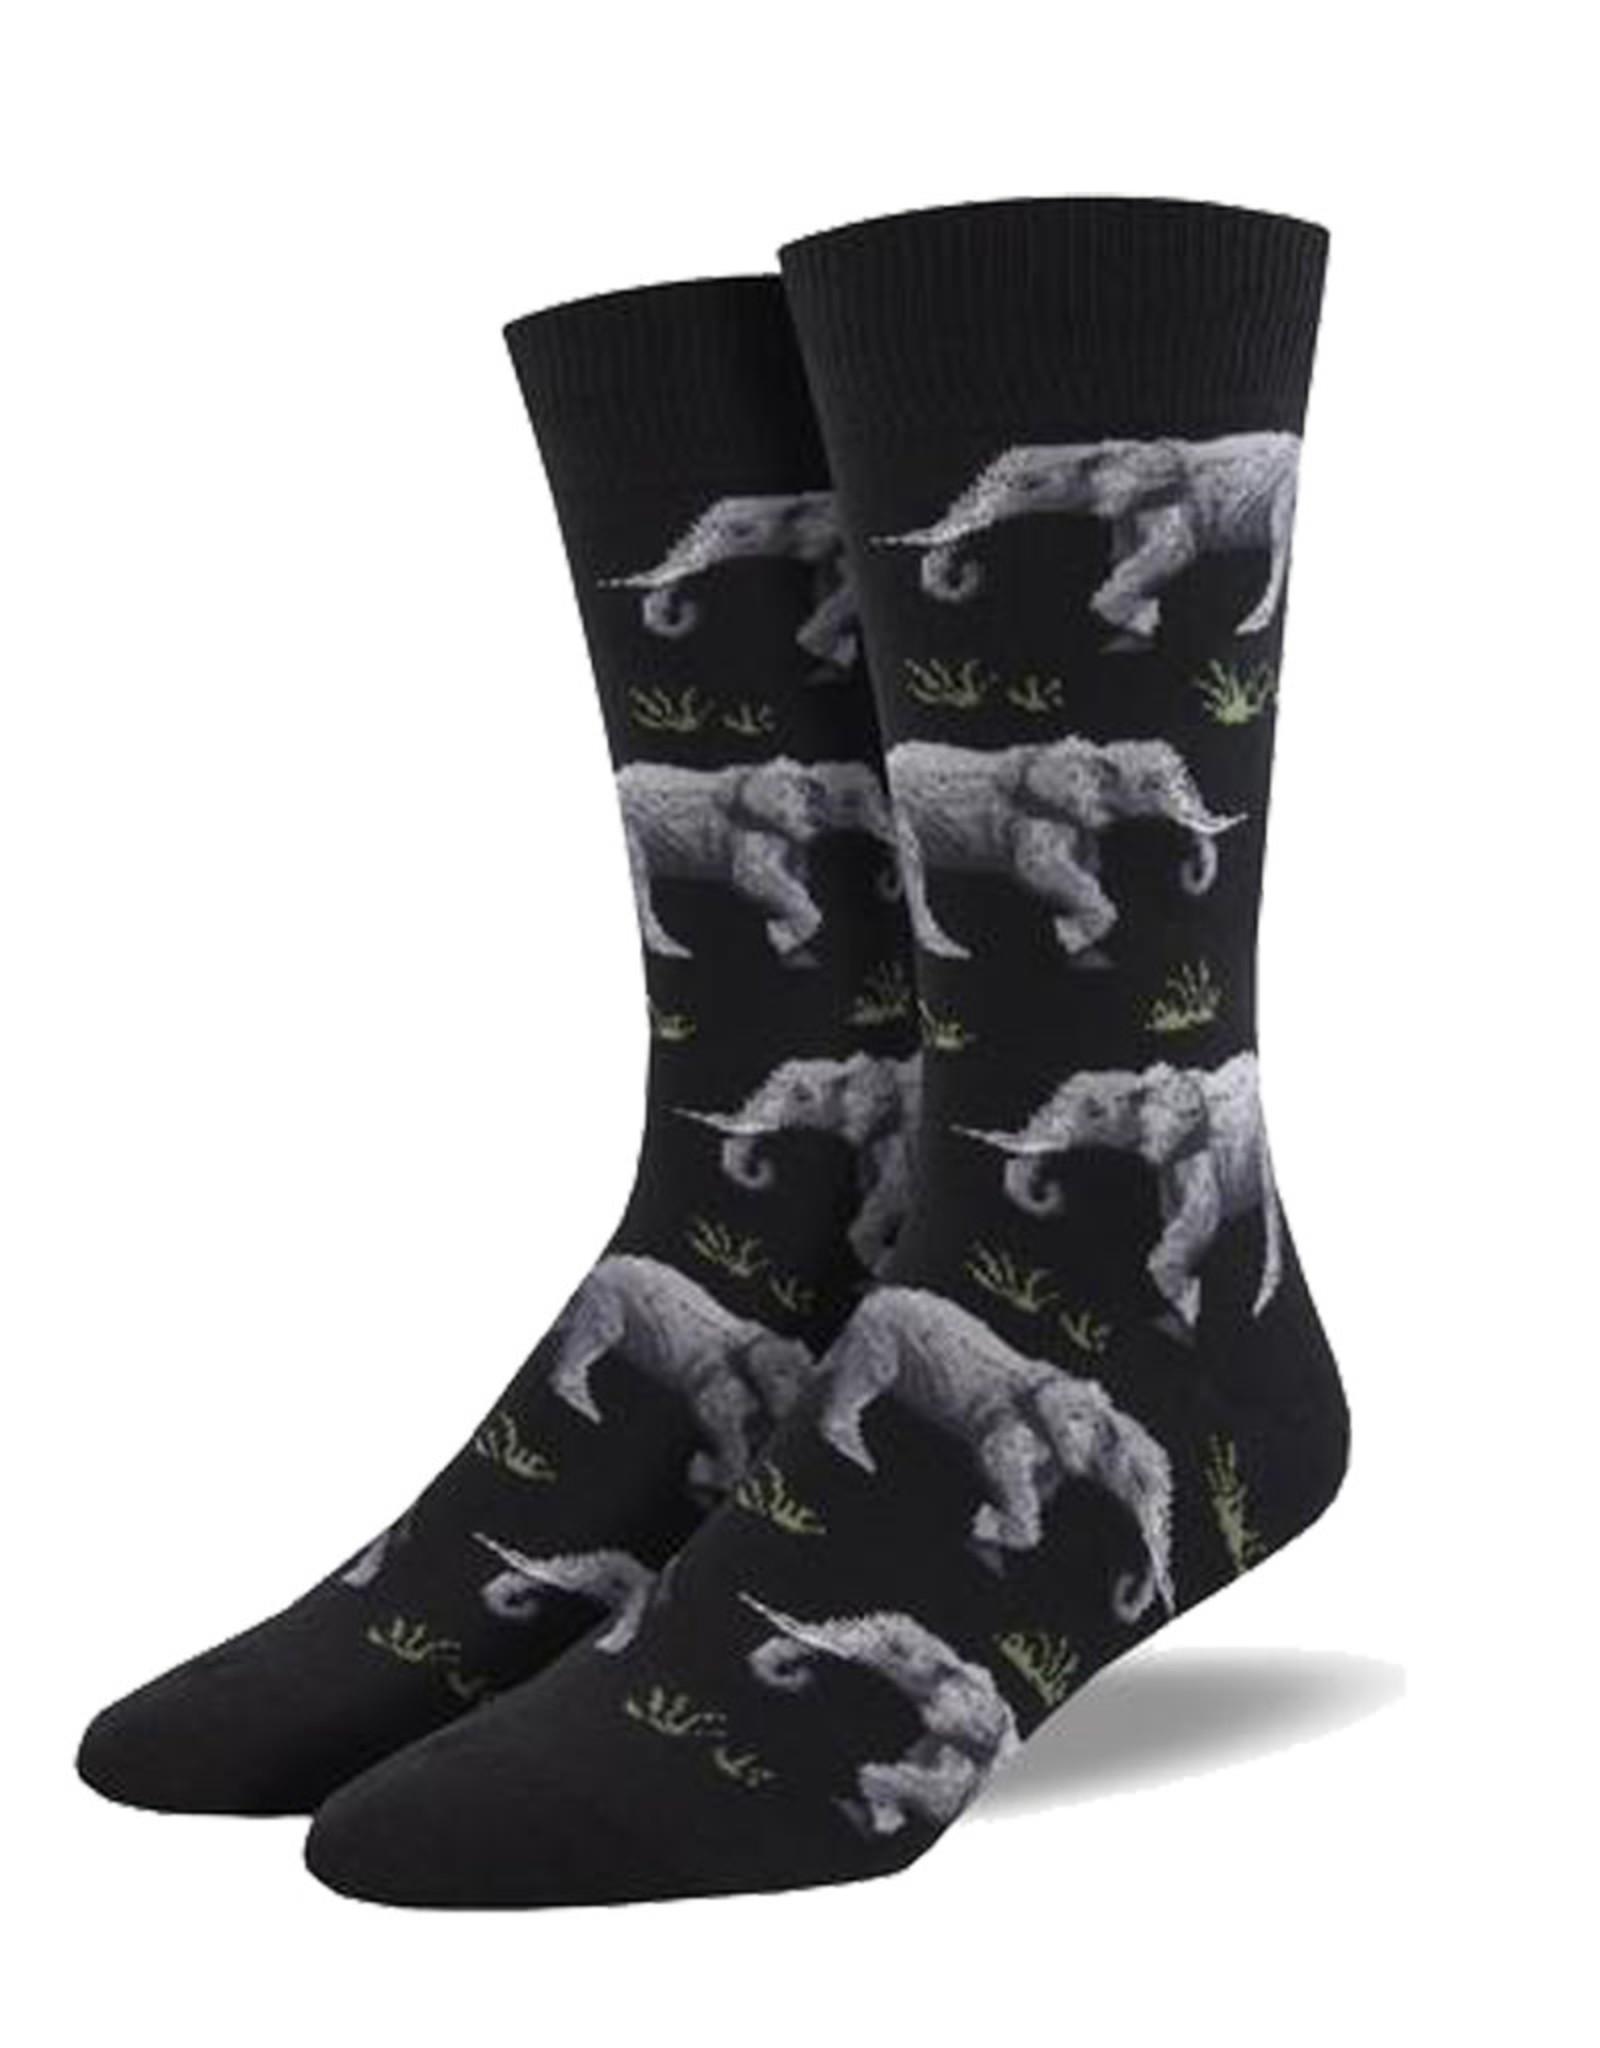 Elephants ( SockSmith Socks  )